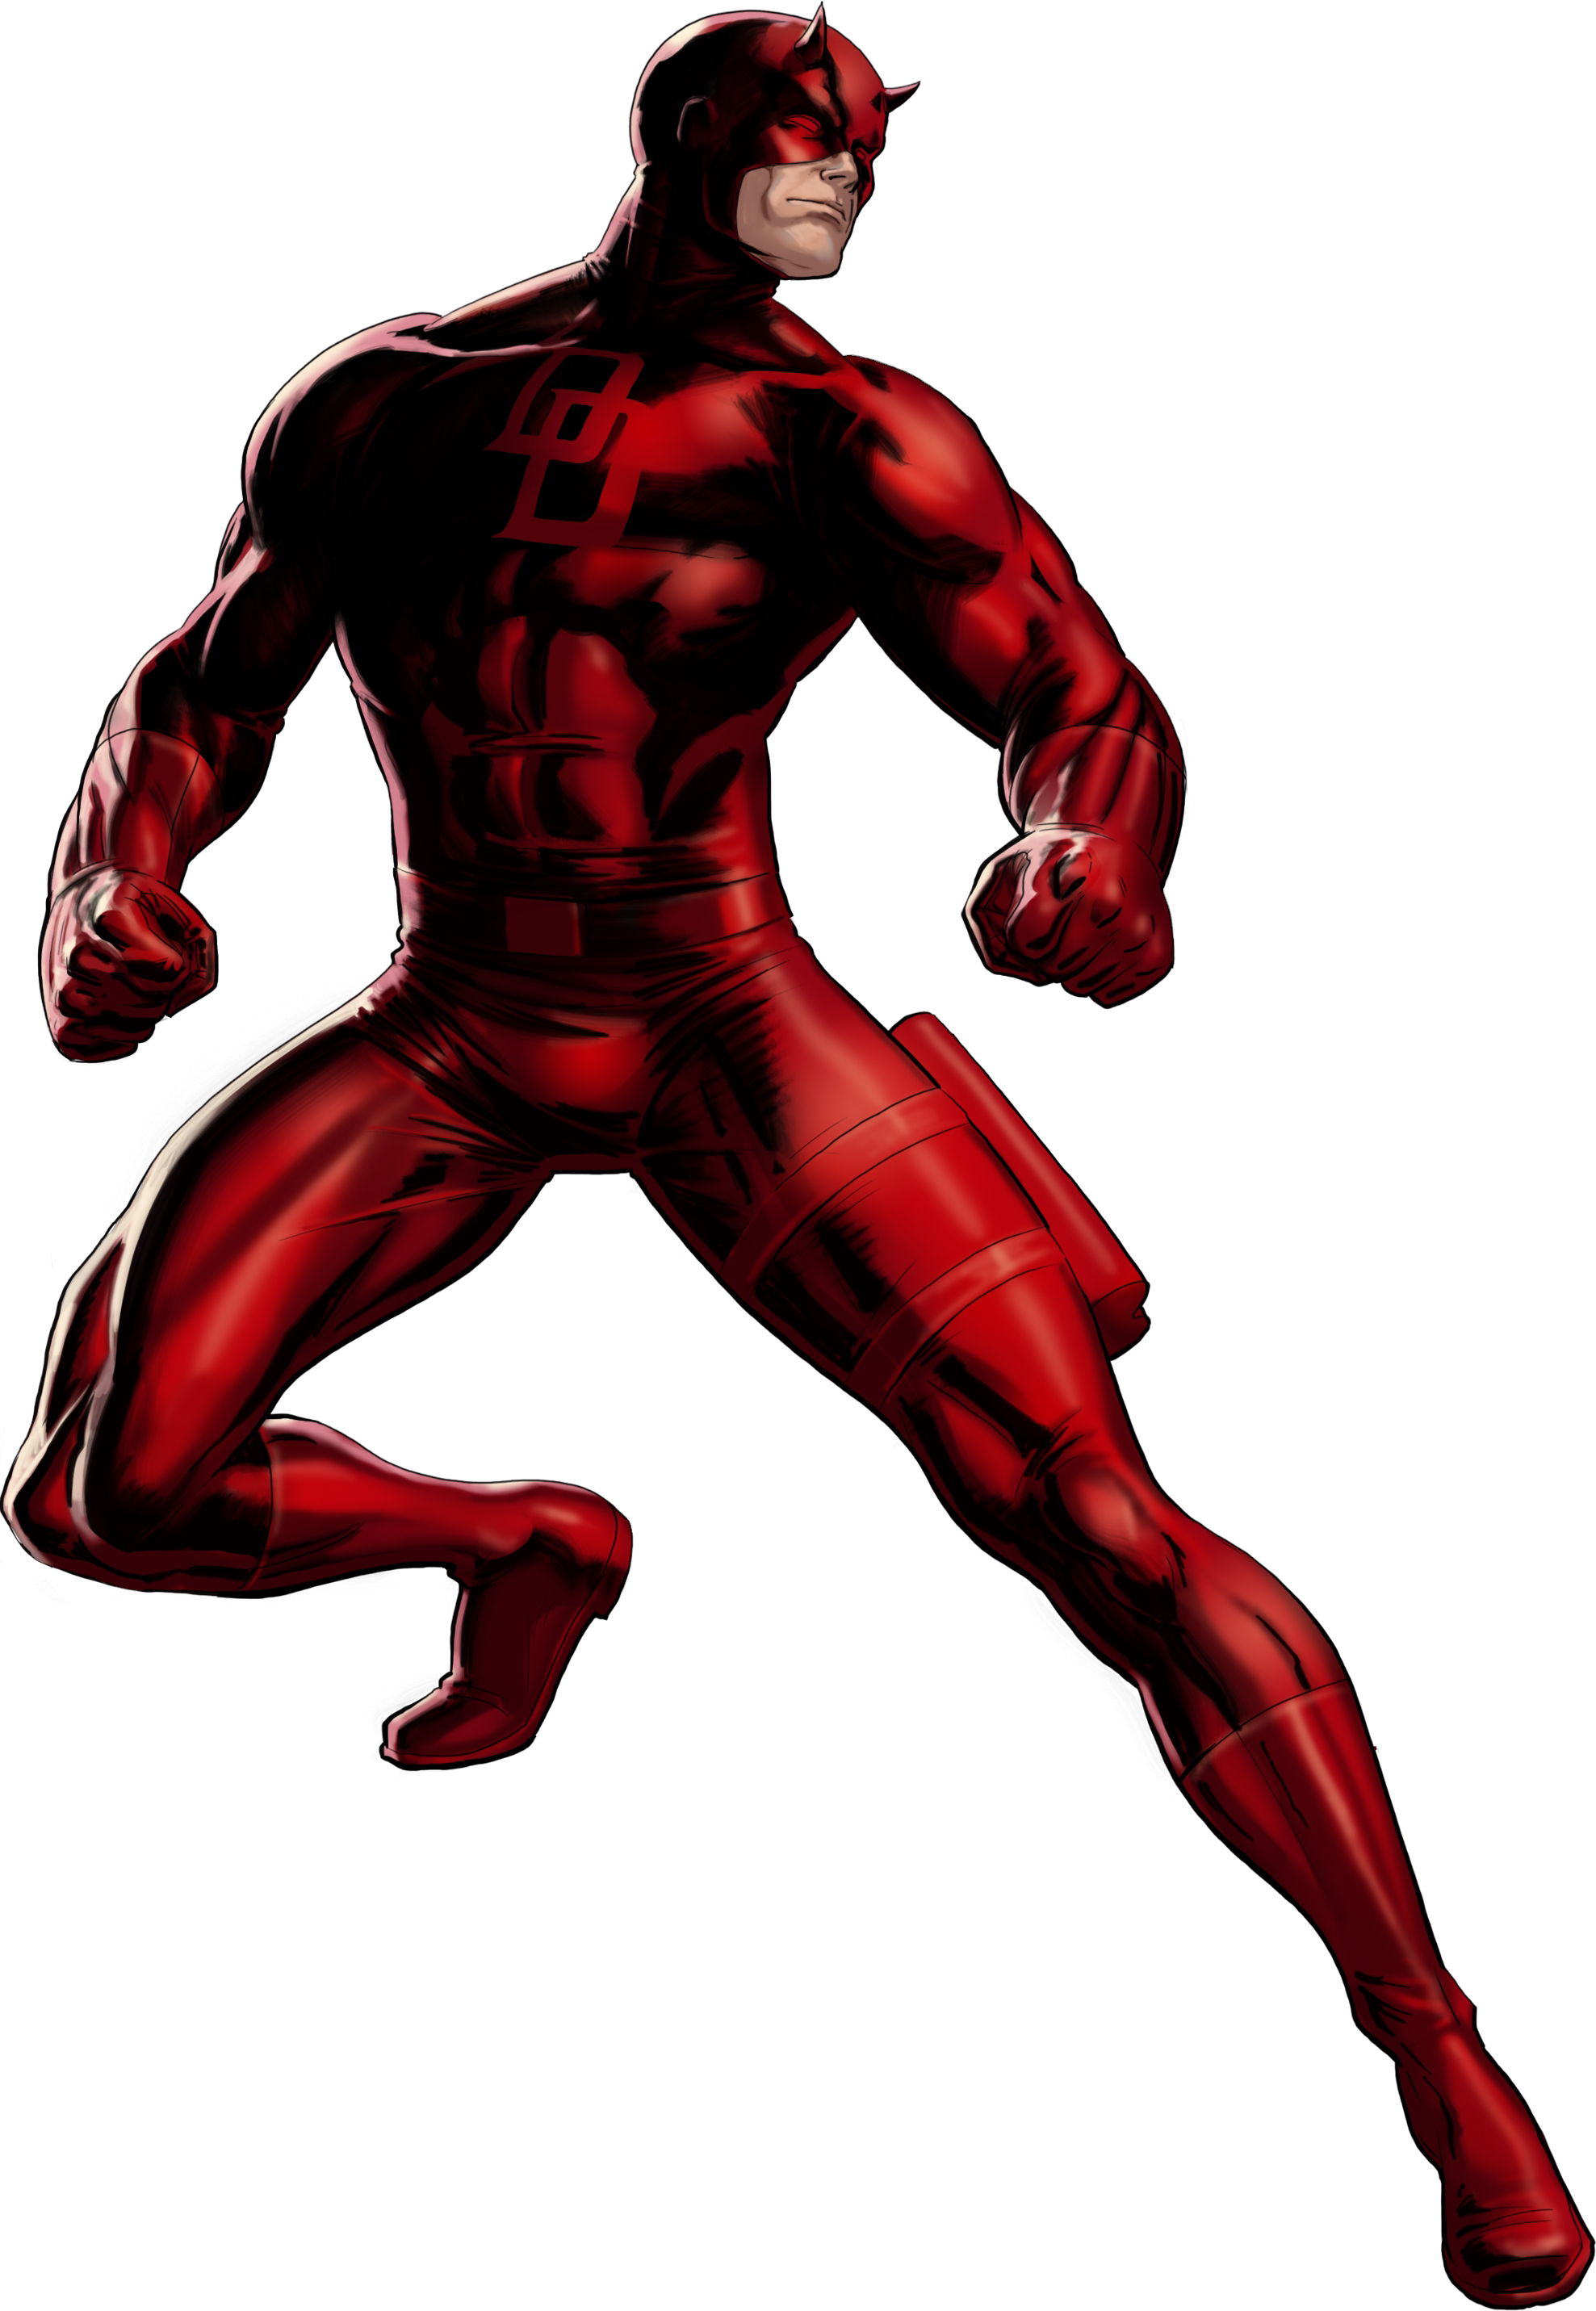 clipart royalty free stock Daredevil transparent avengers alliance. Marvel black widow